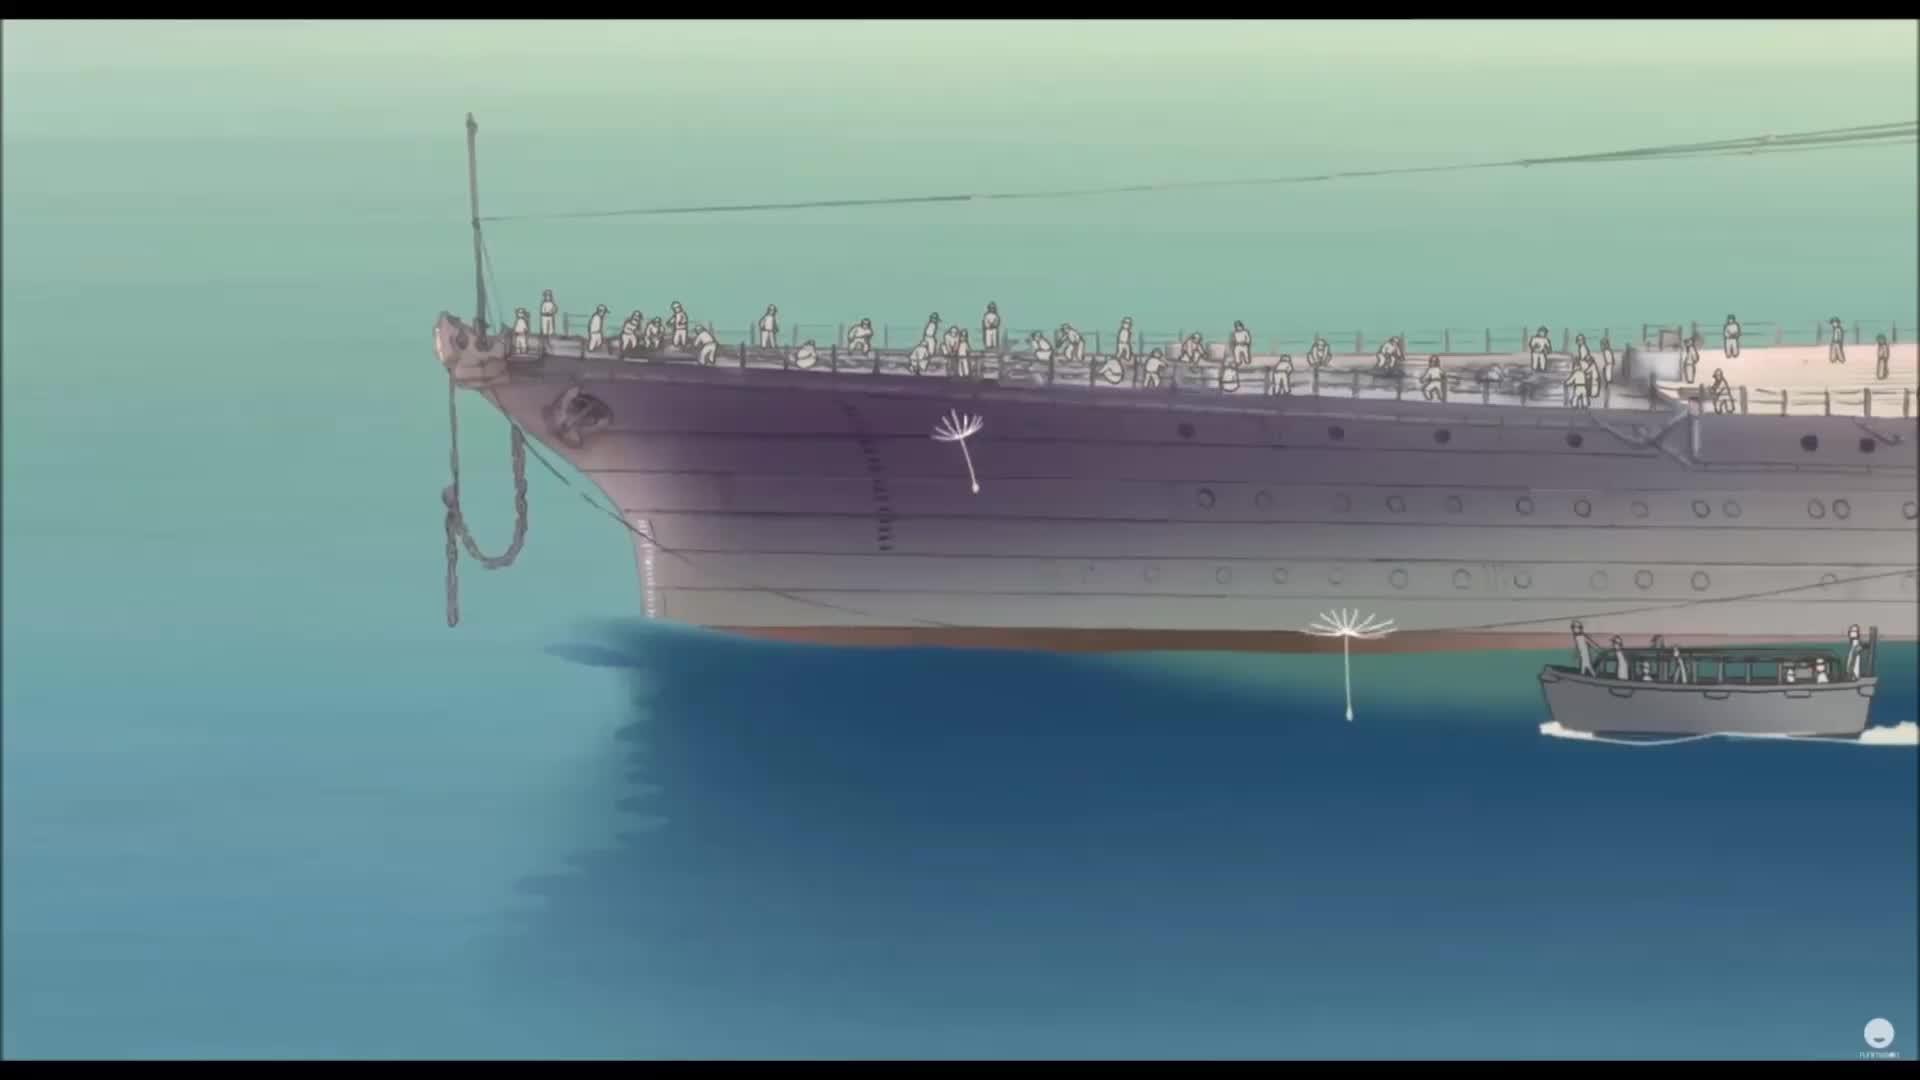 anime, funimation, in this corner of the world, inthiscorneroftheworld, kono sekai no katasumi ni, A closer look at the Yamato. GIFs